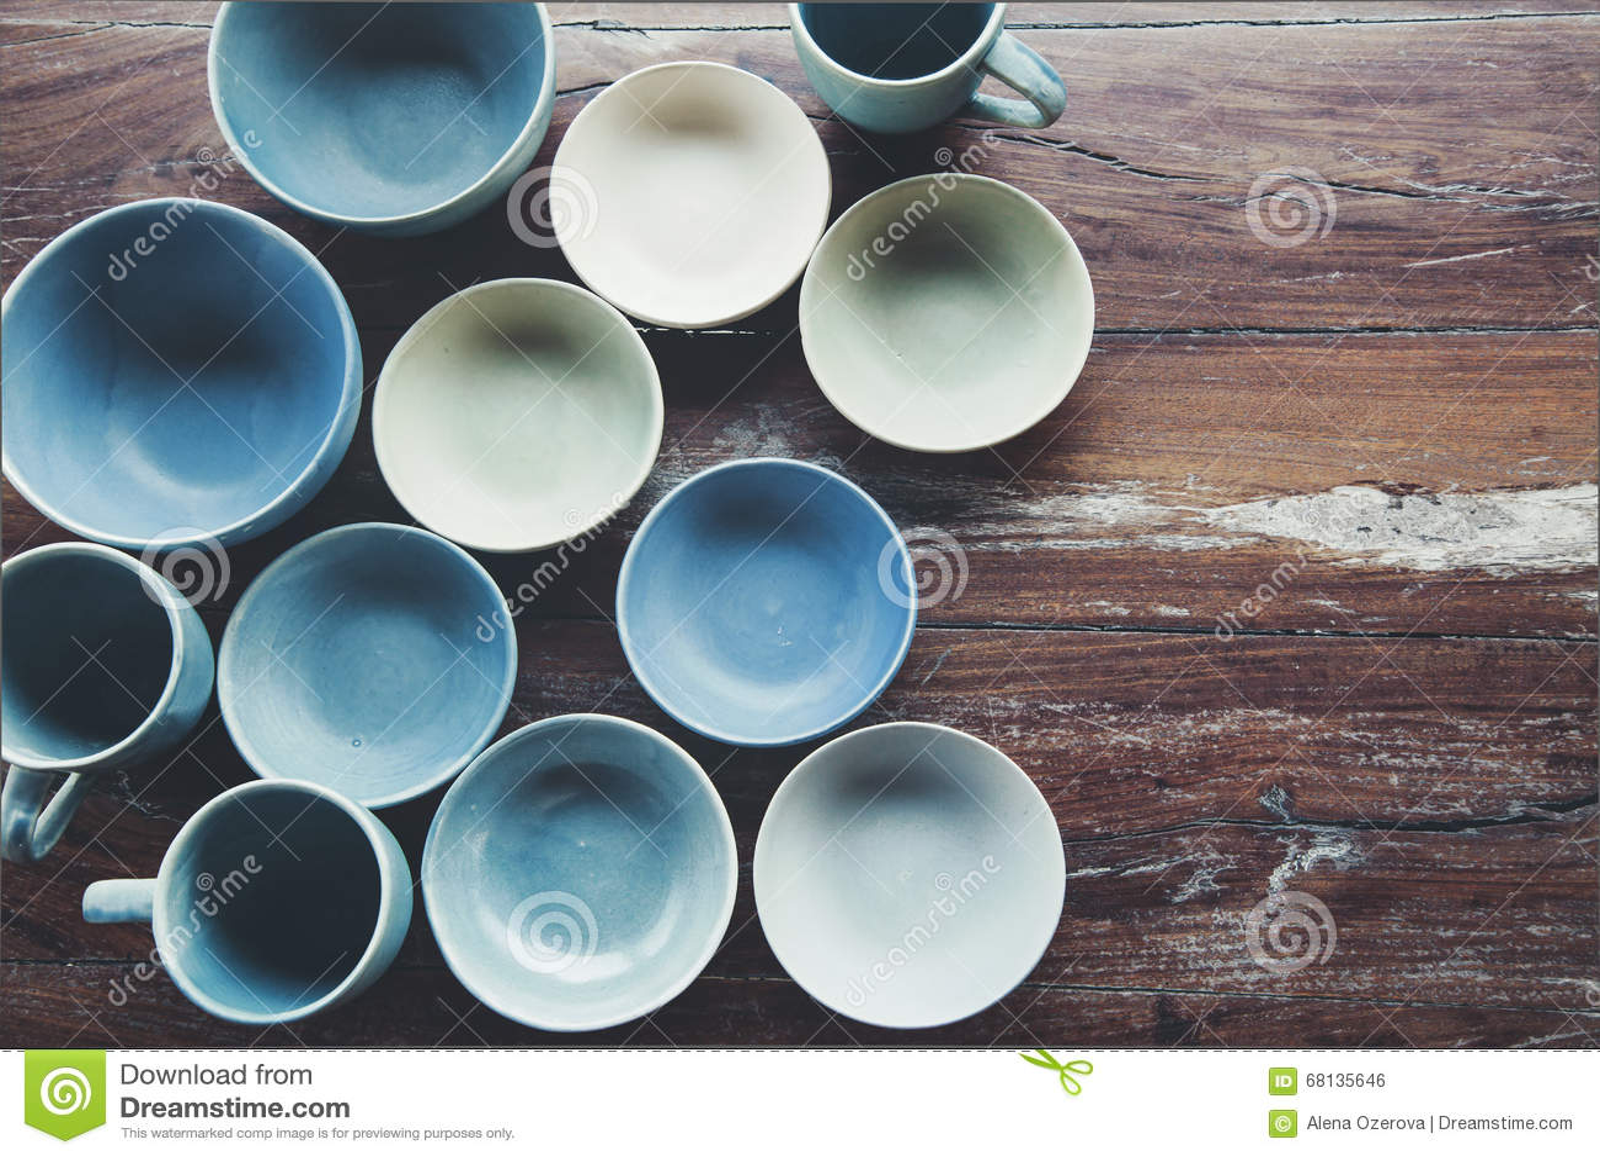 Platos de cer mica hechos a mano foto de archivo imagen - Platos de ceramica ...